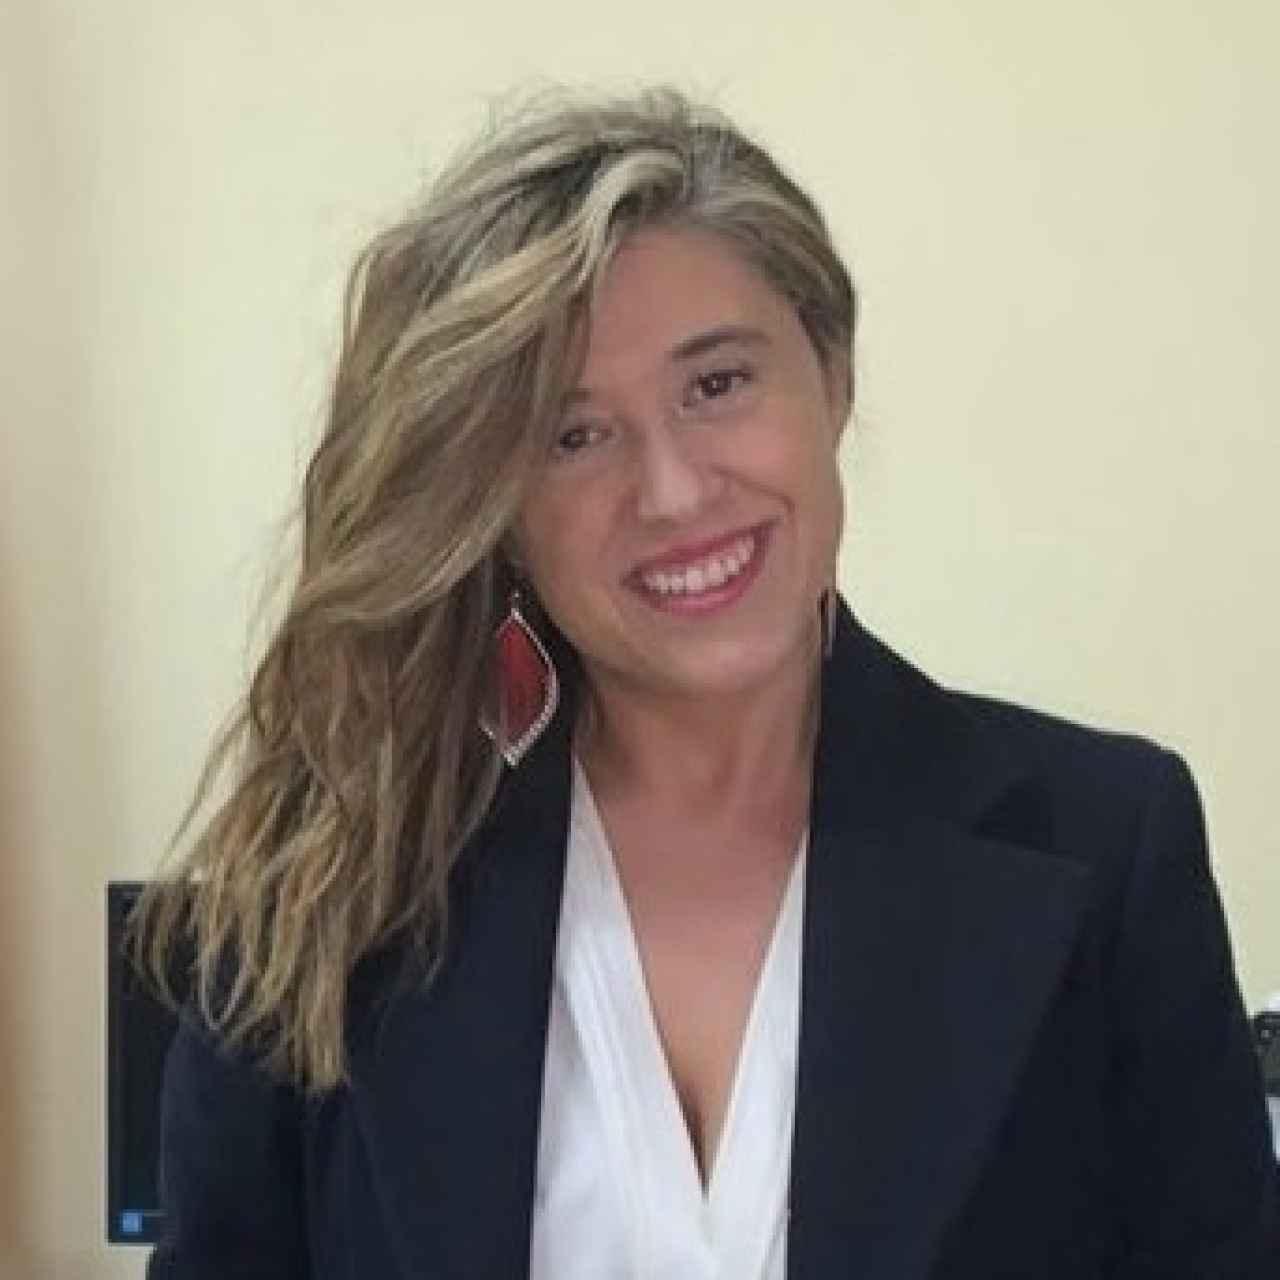 Escarlata Gutiérrez, la fiscal 'influencer'